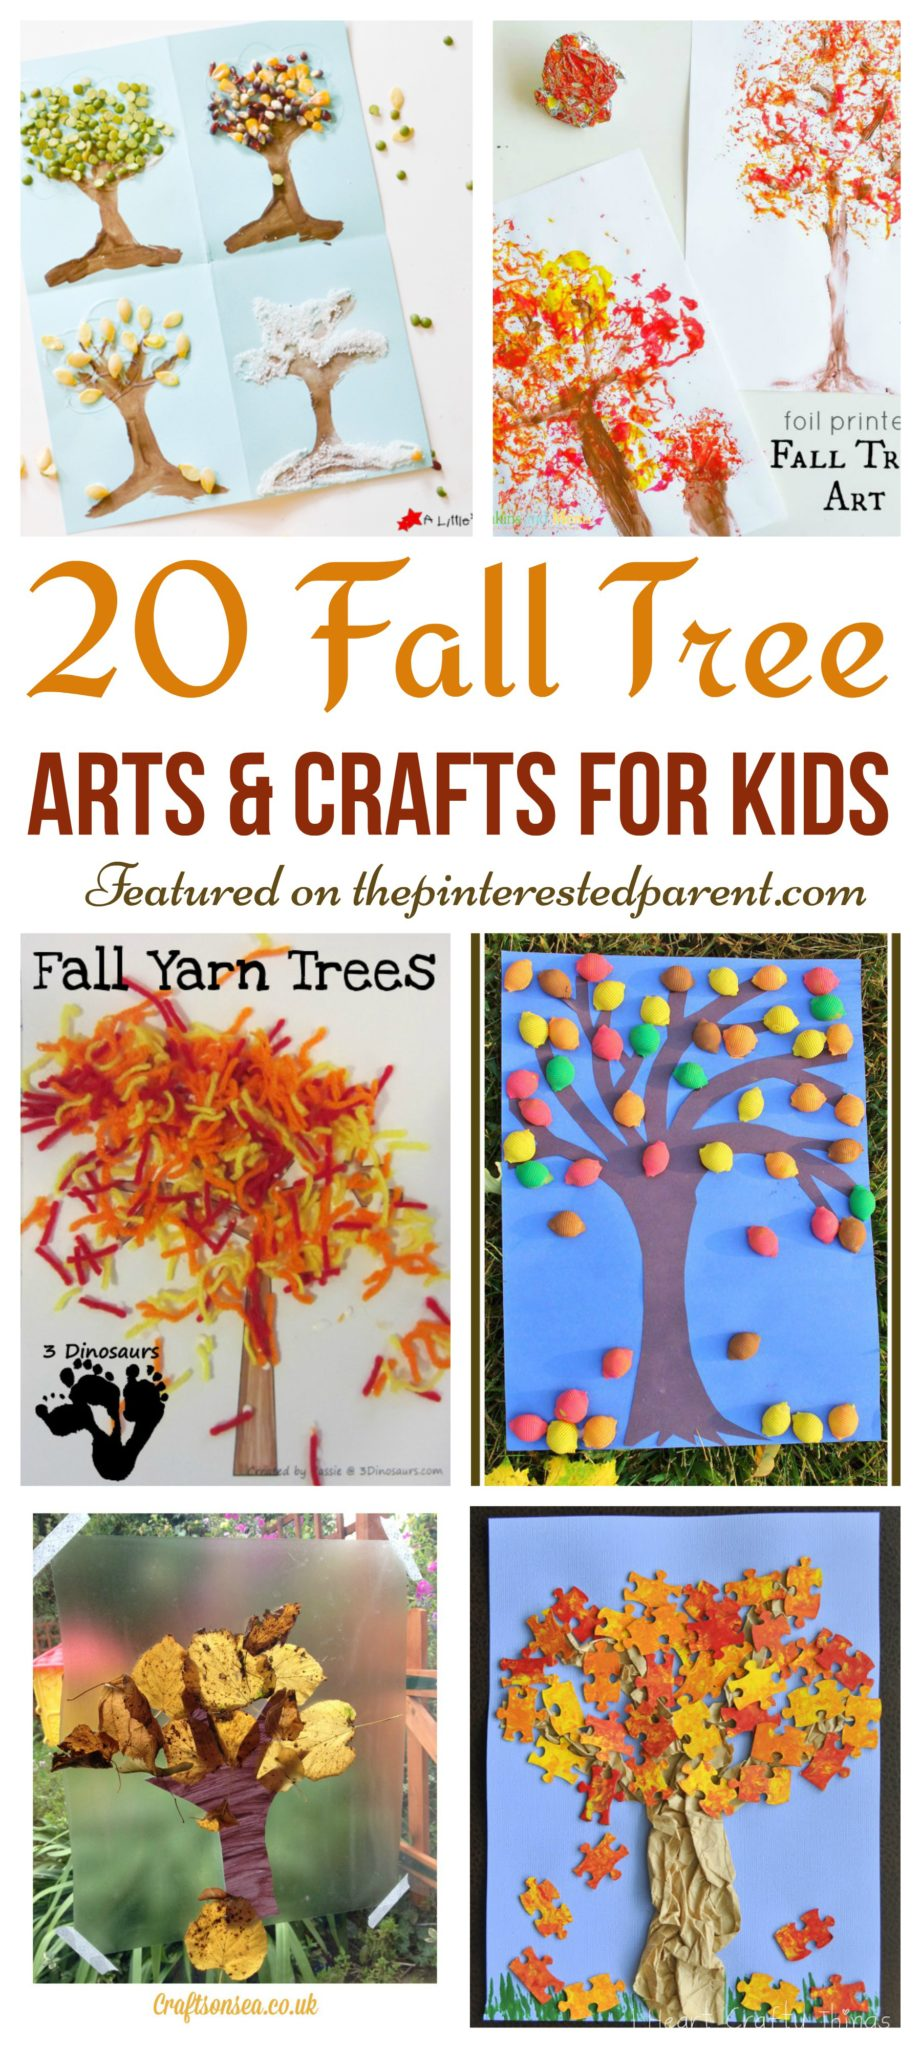 20 fall tree arts u0026 crafts ideas for kids u2013 the pinterested parent